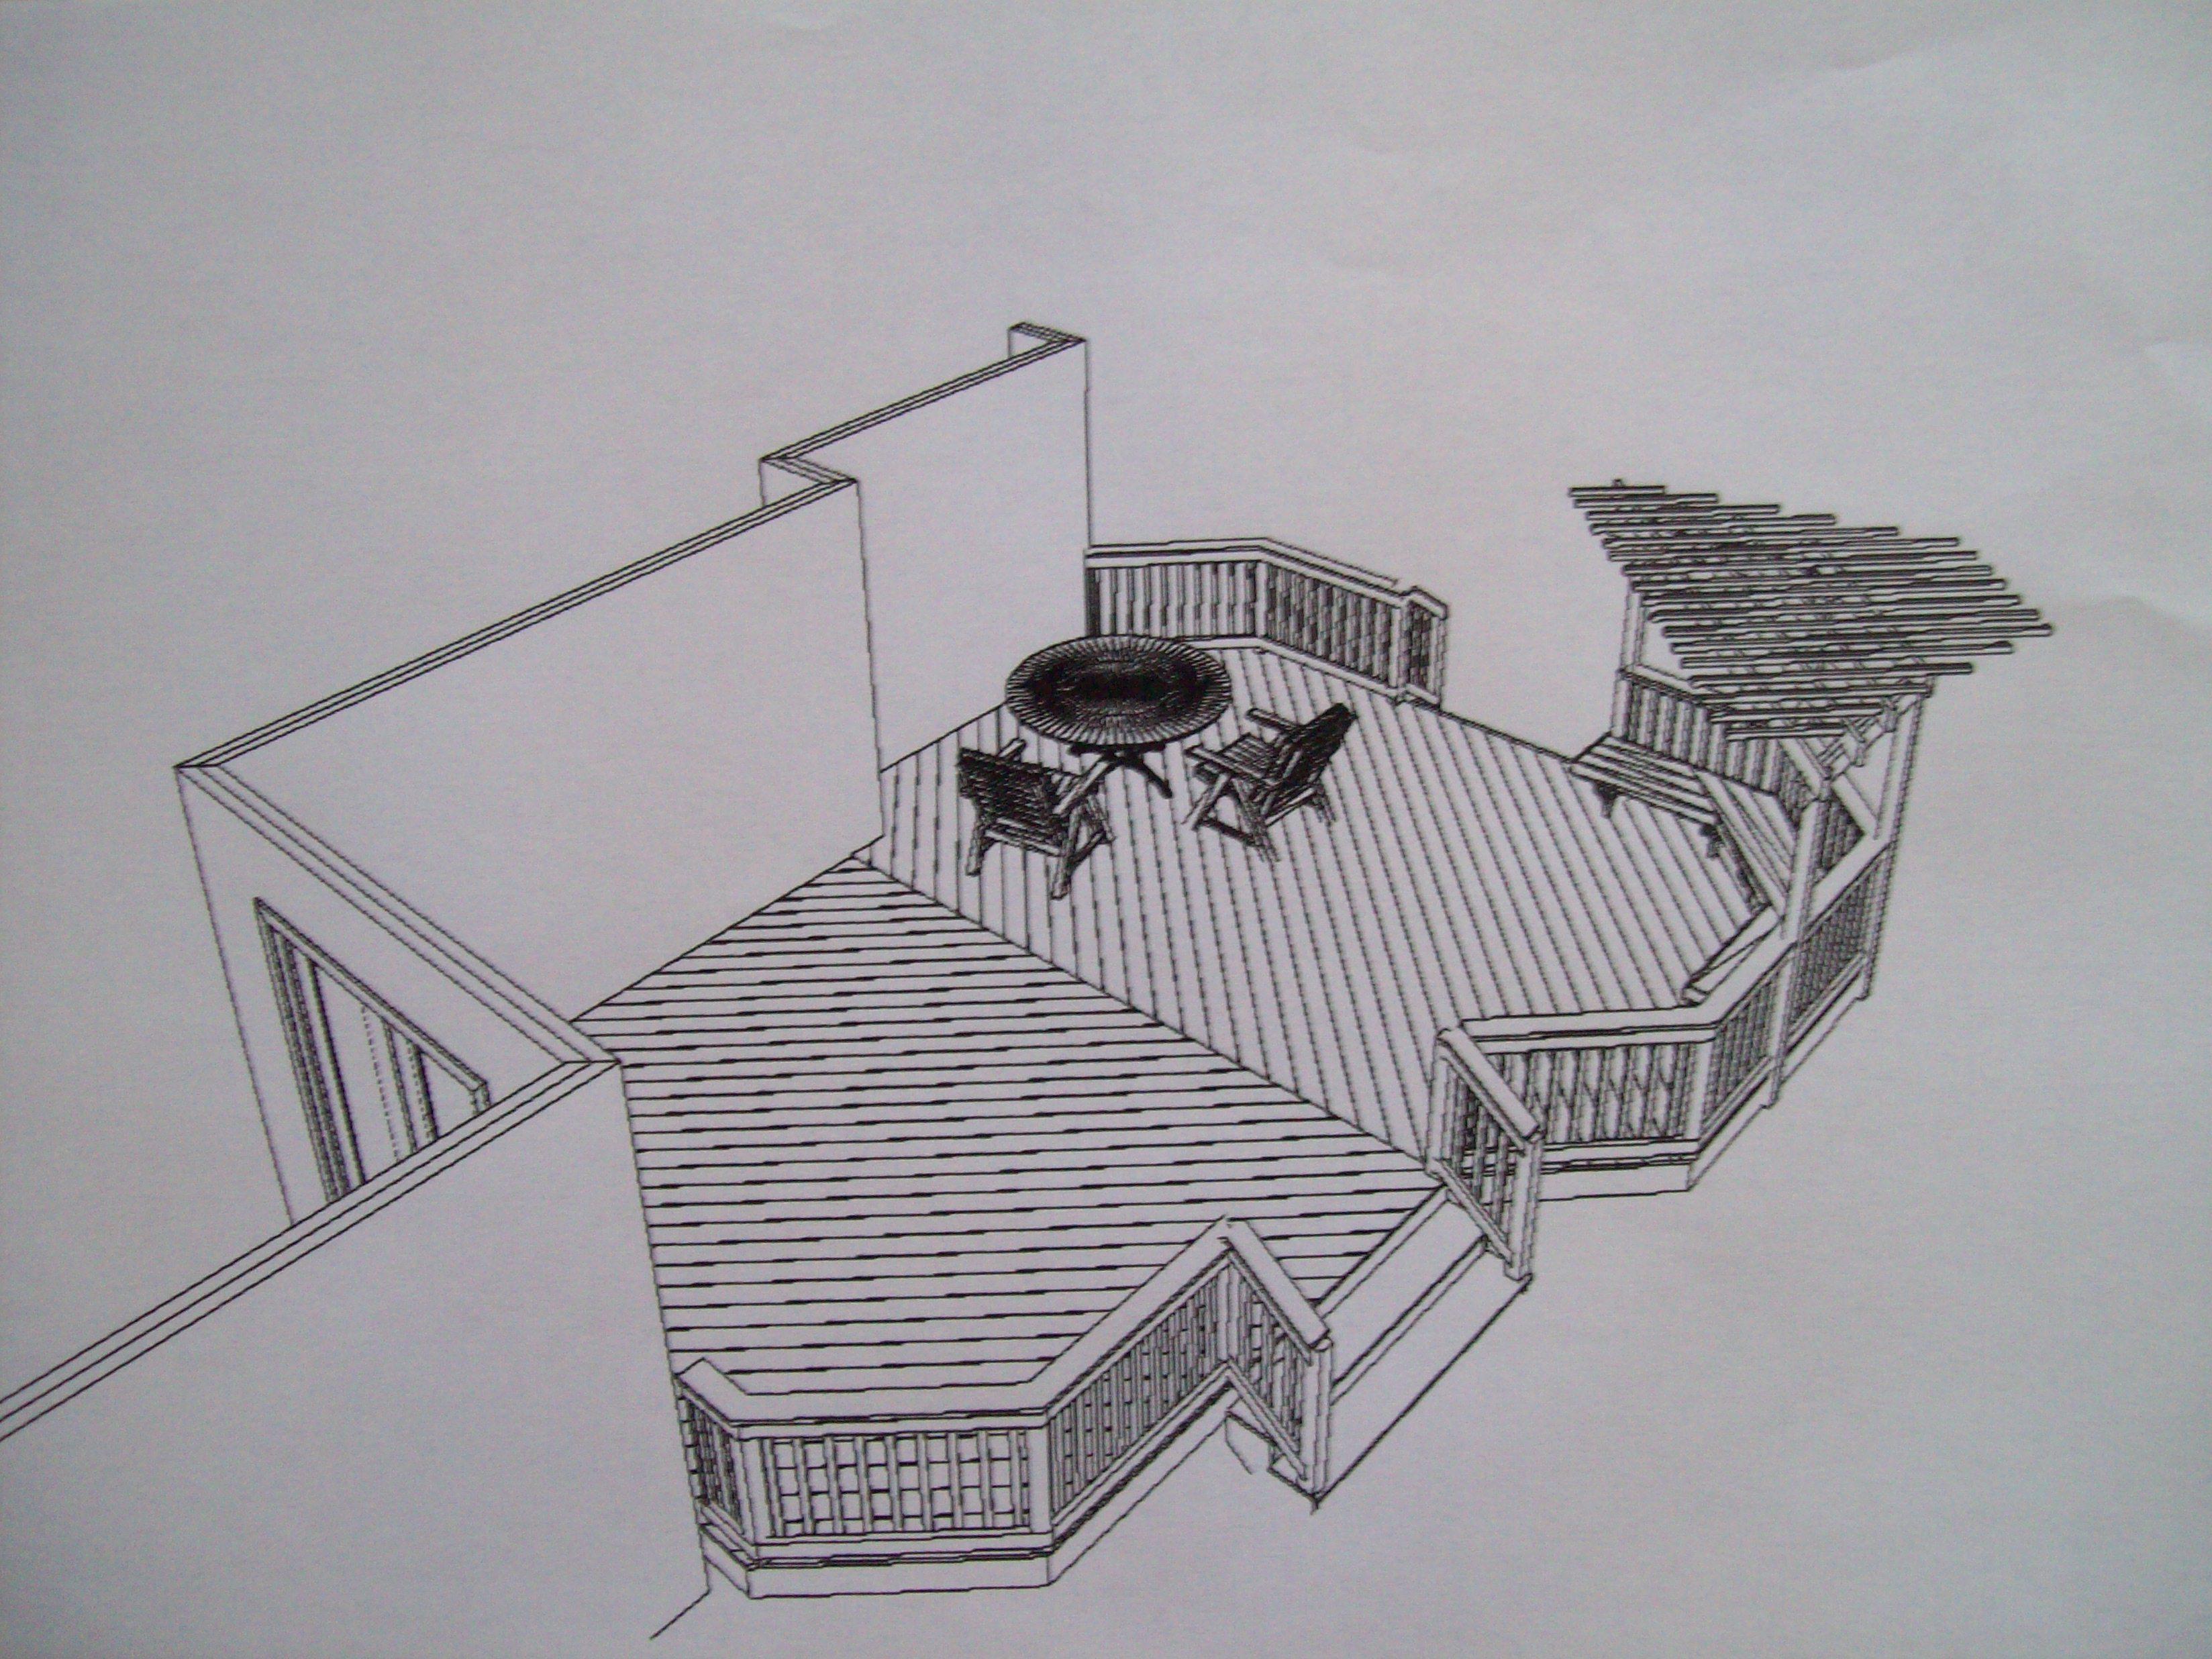 Diy pergola designs existing deck plans free for Wood deck plans pdf